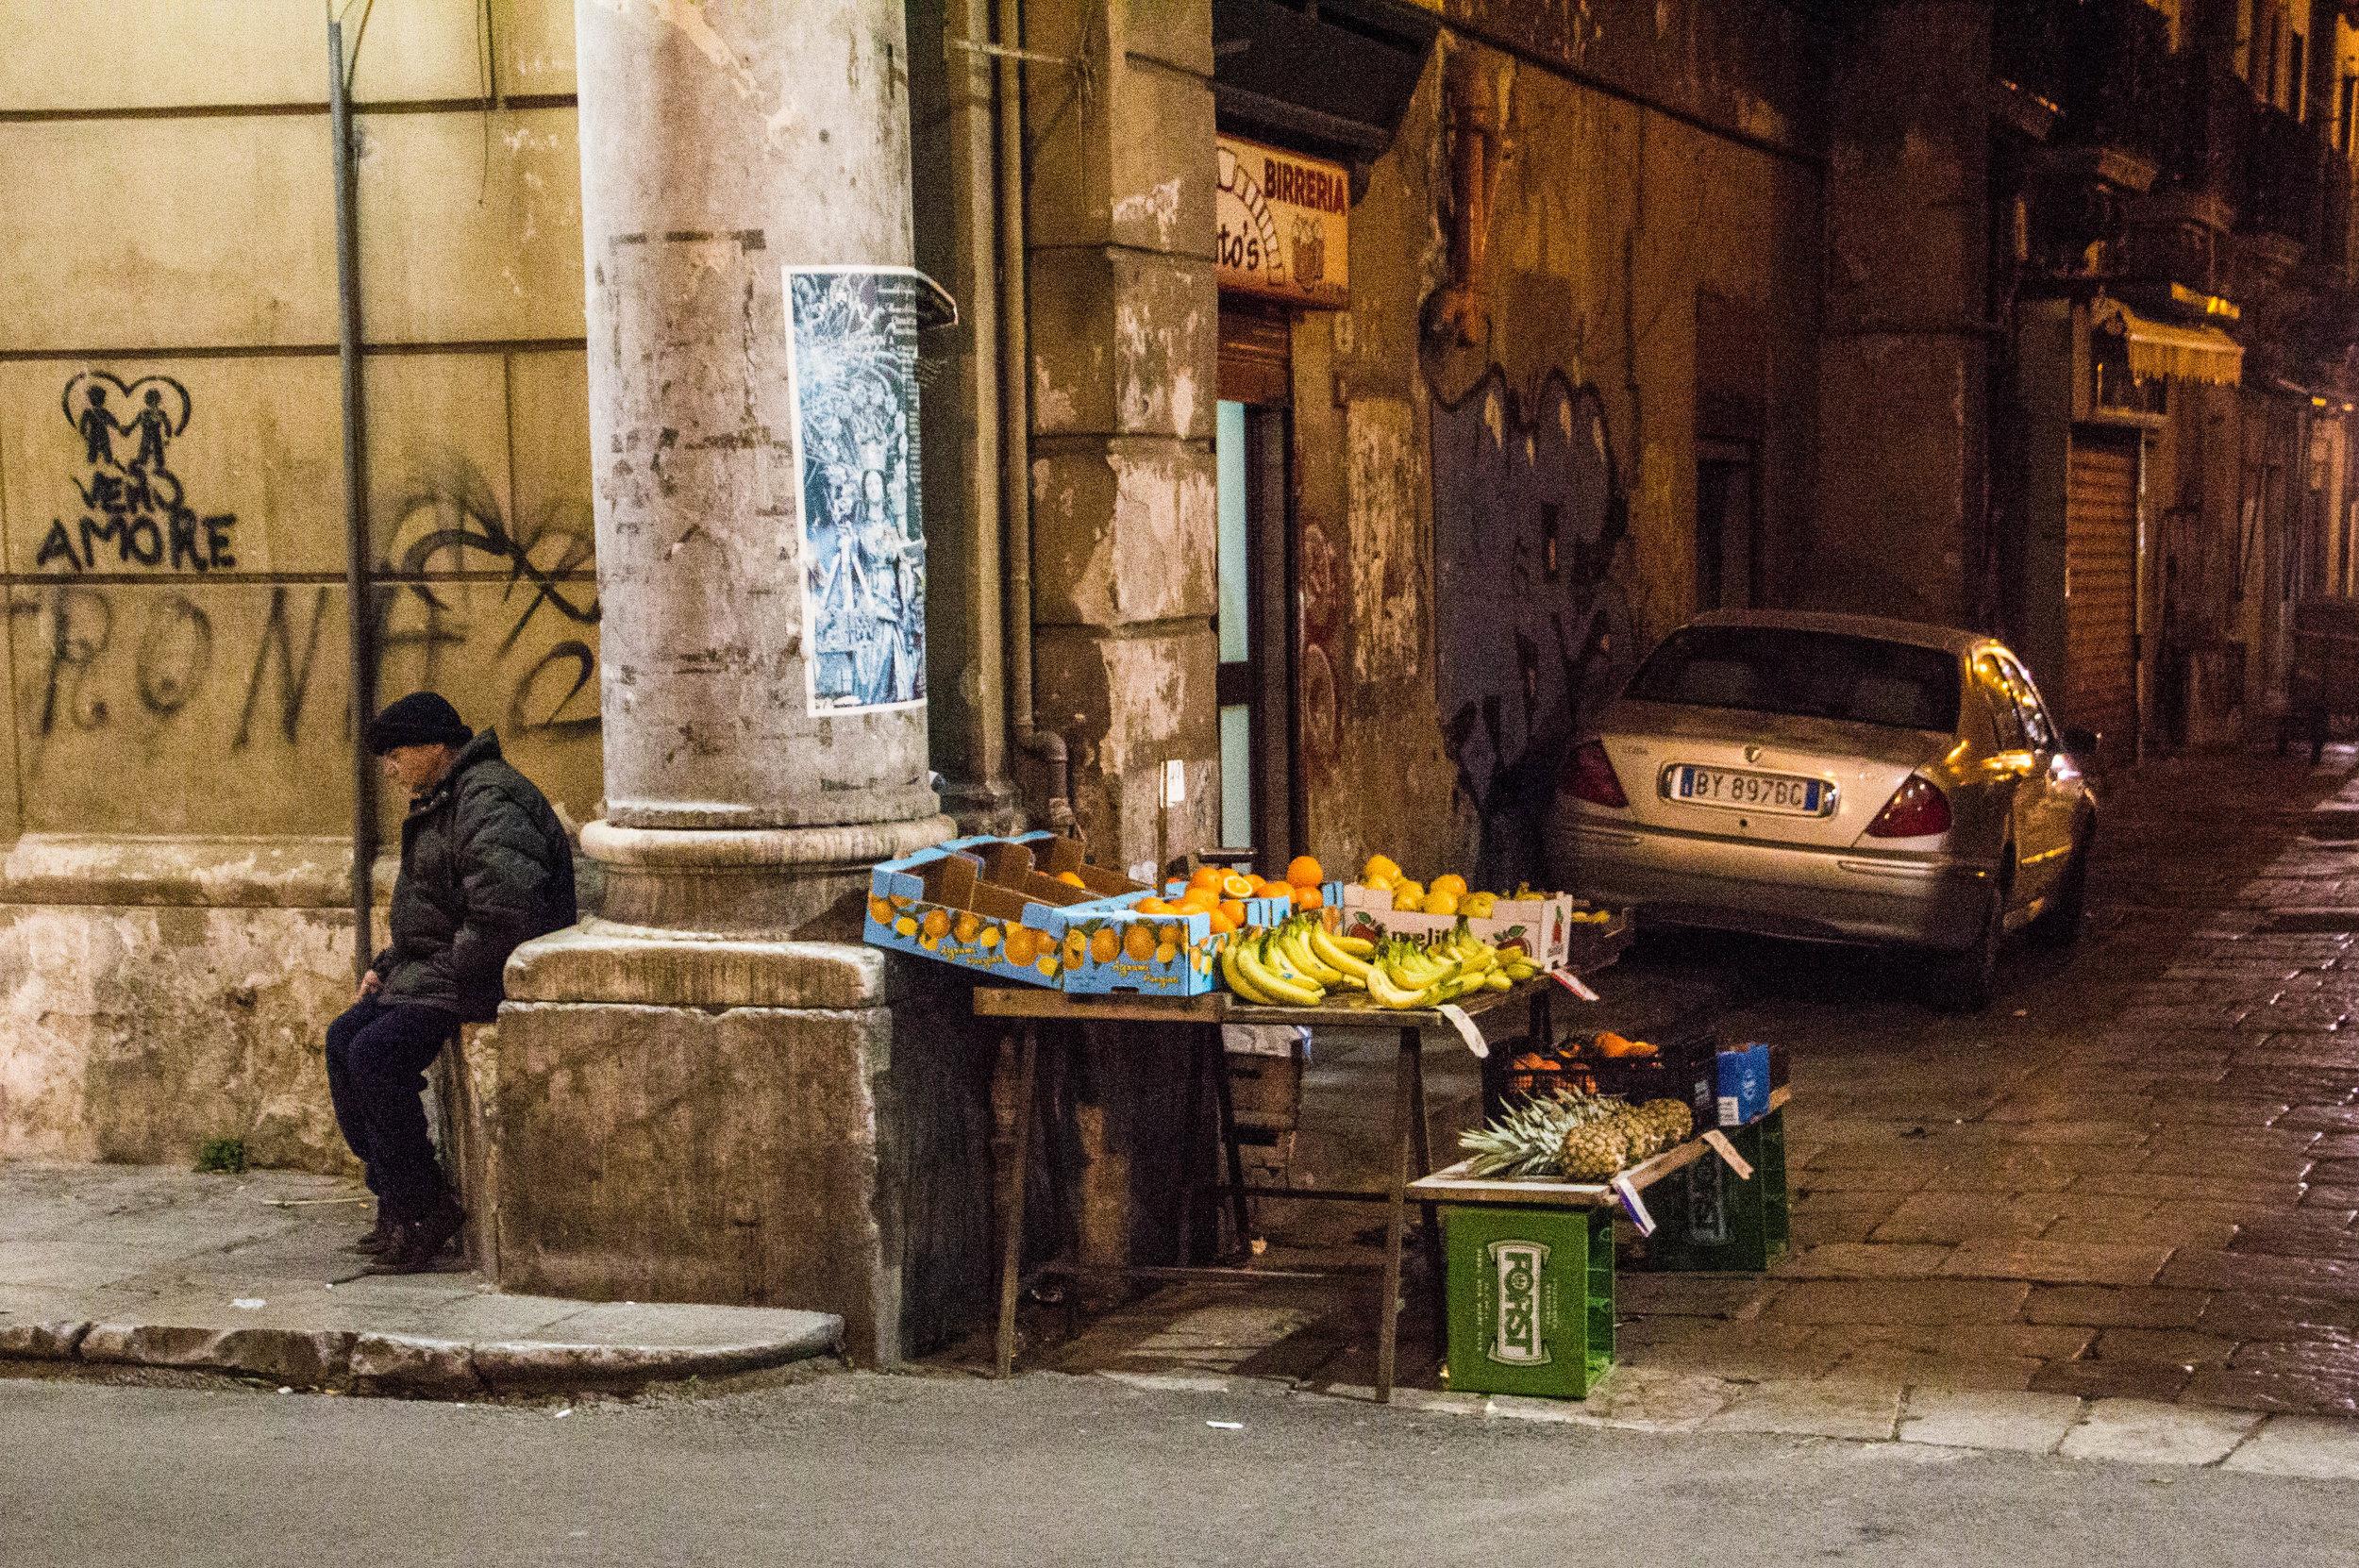 night-street-market-palermo-sicily-13.jpg